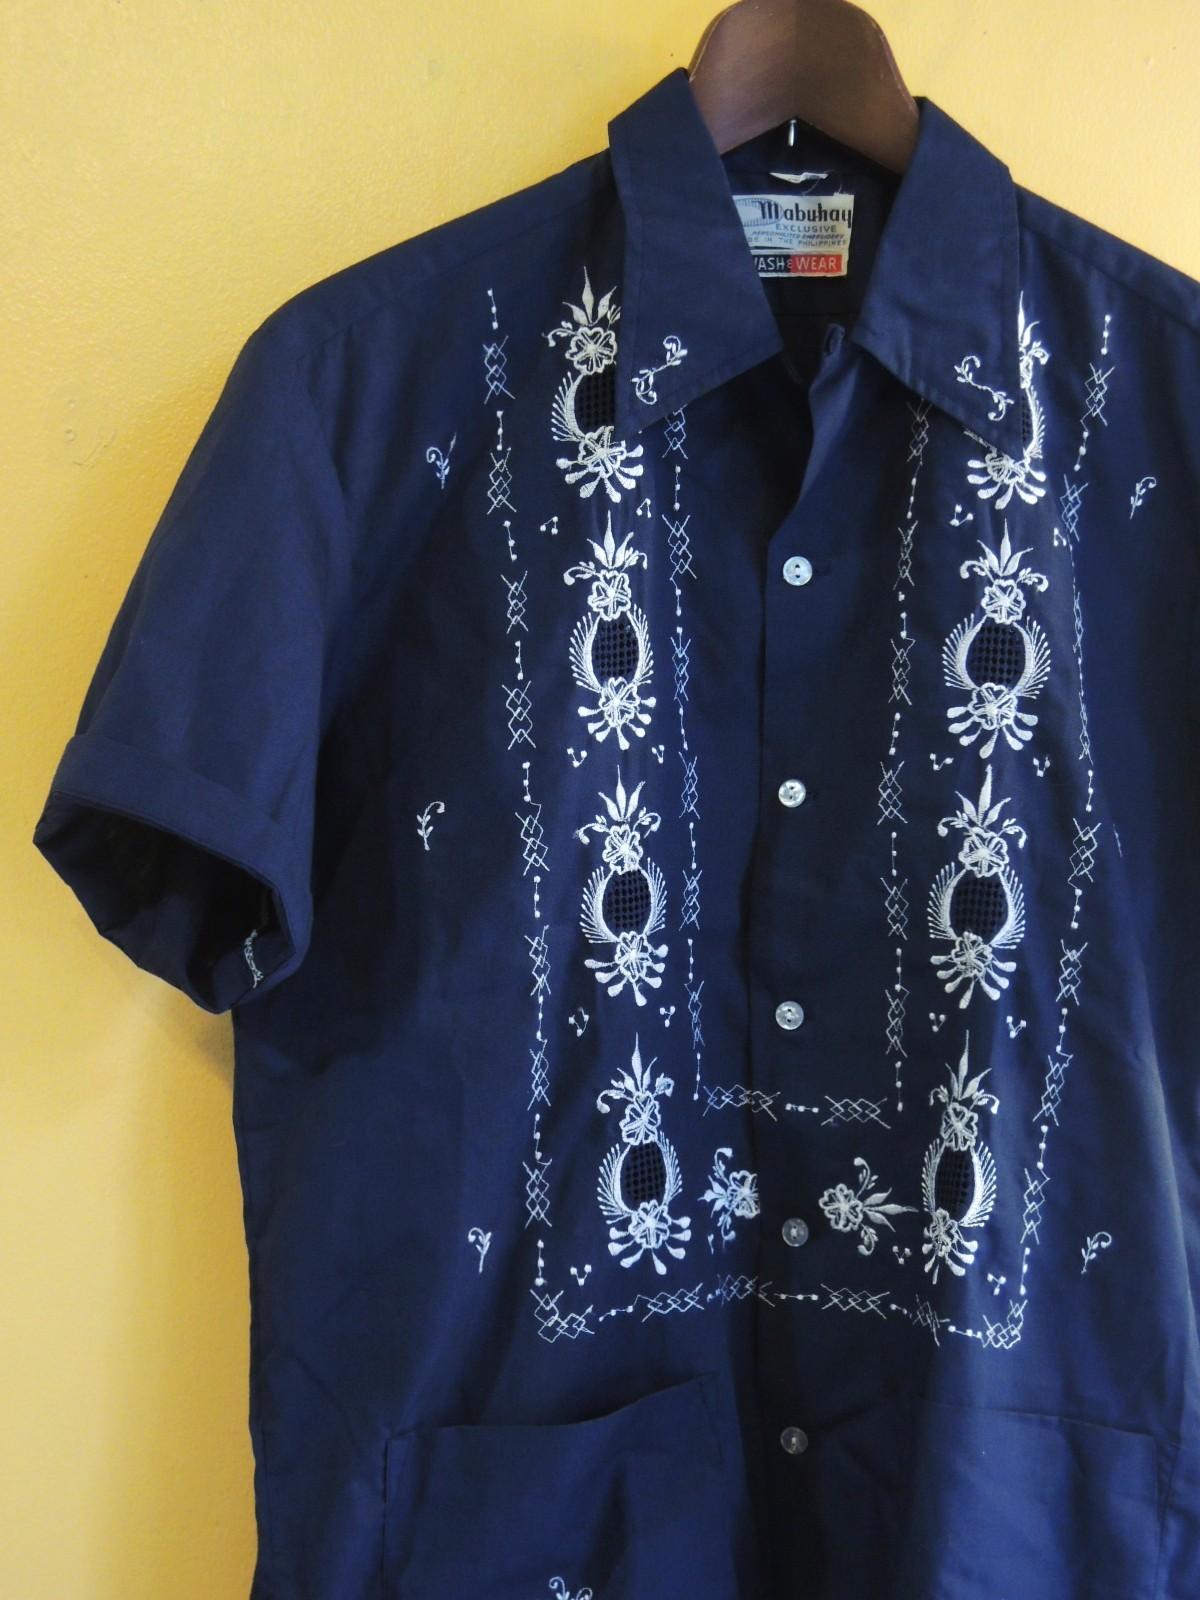 shirts04.JPG